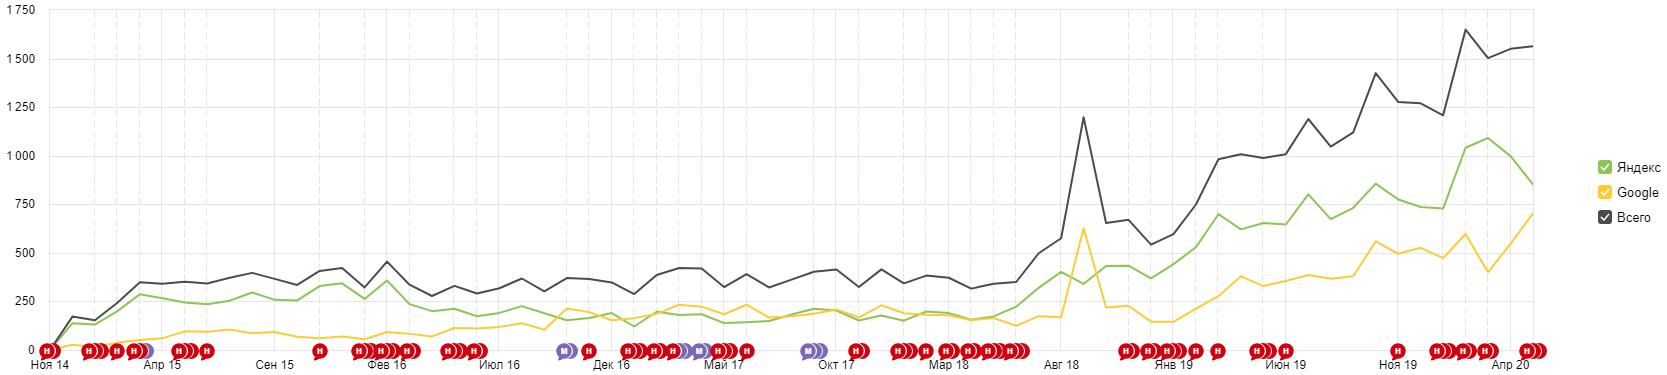 Кейс: продвижение сайта склада ответственного хранения и рост трафика на 809%